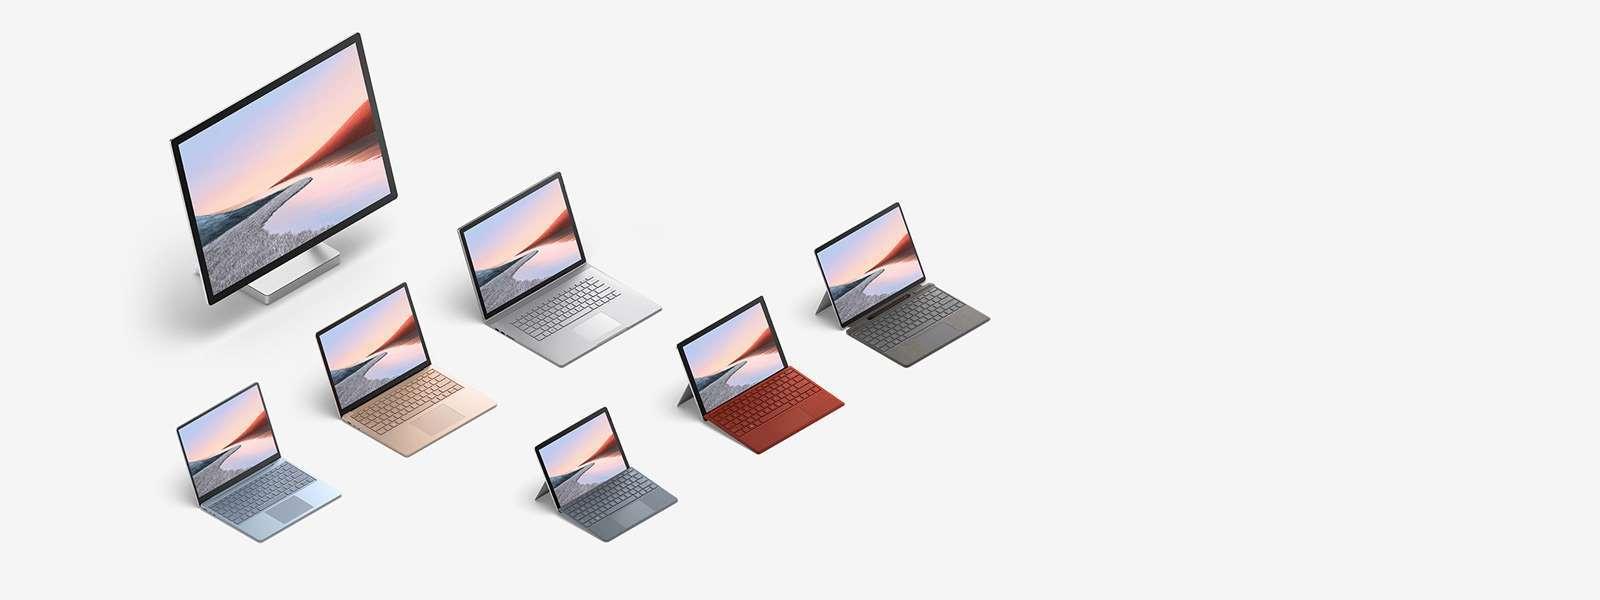 Surface 电脑系列